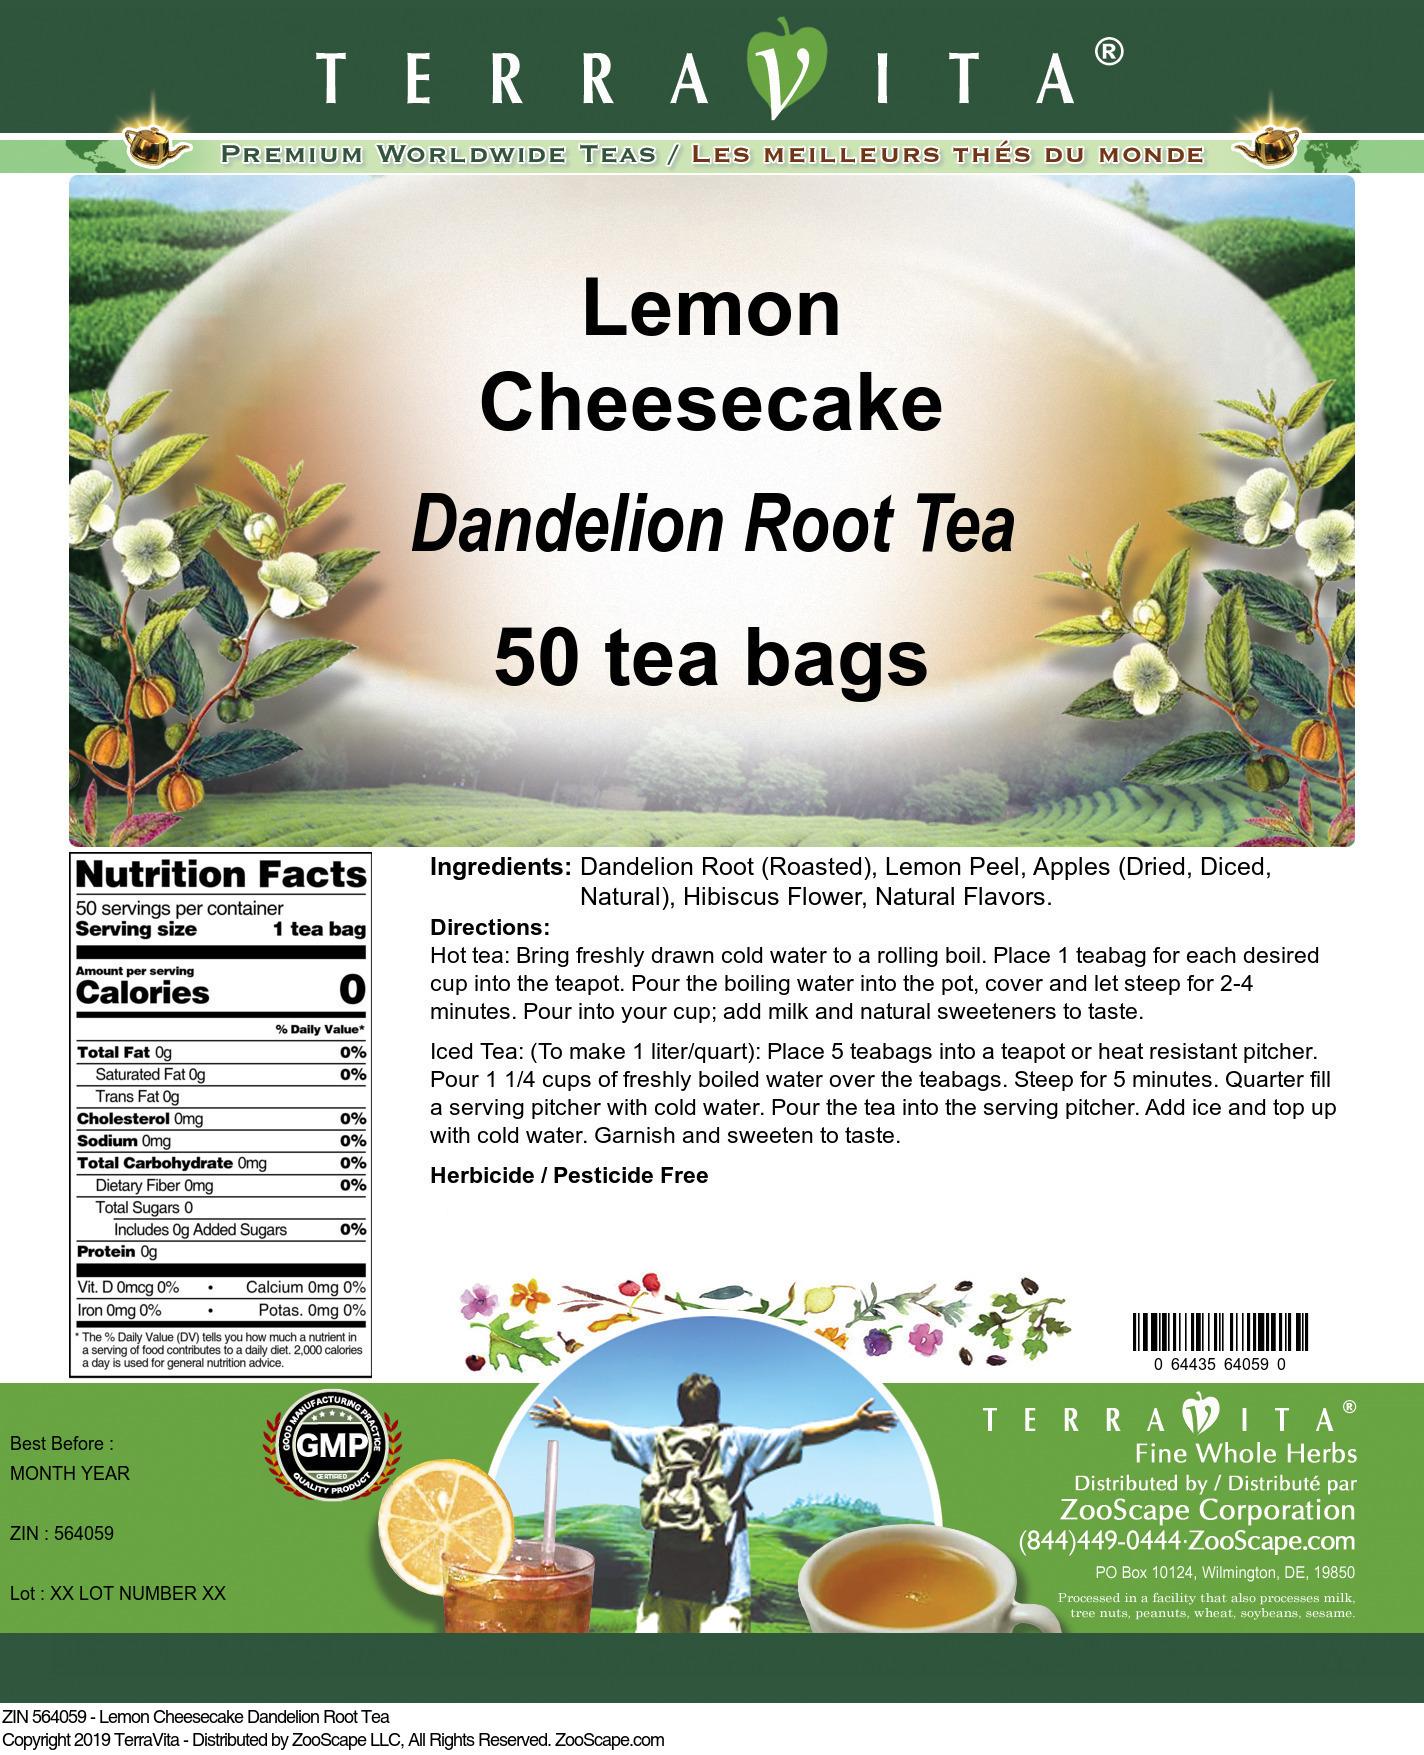 Lemon Cheesecake Dandelion Root Tea